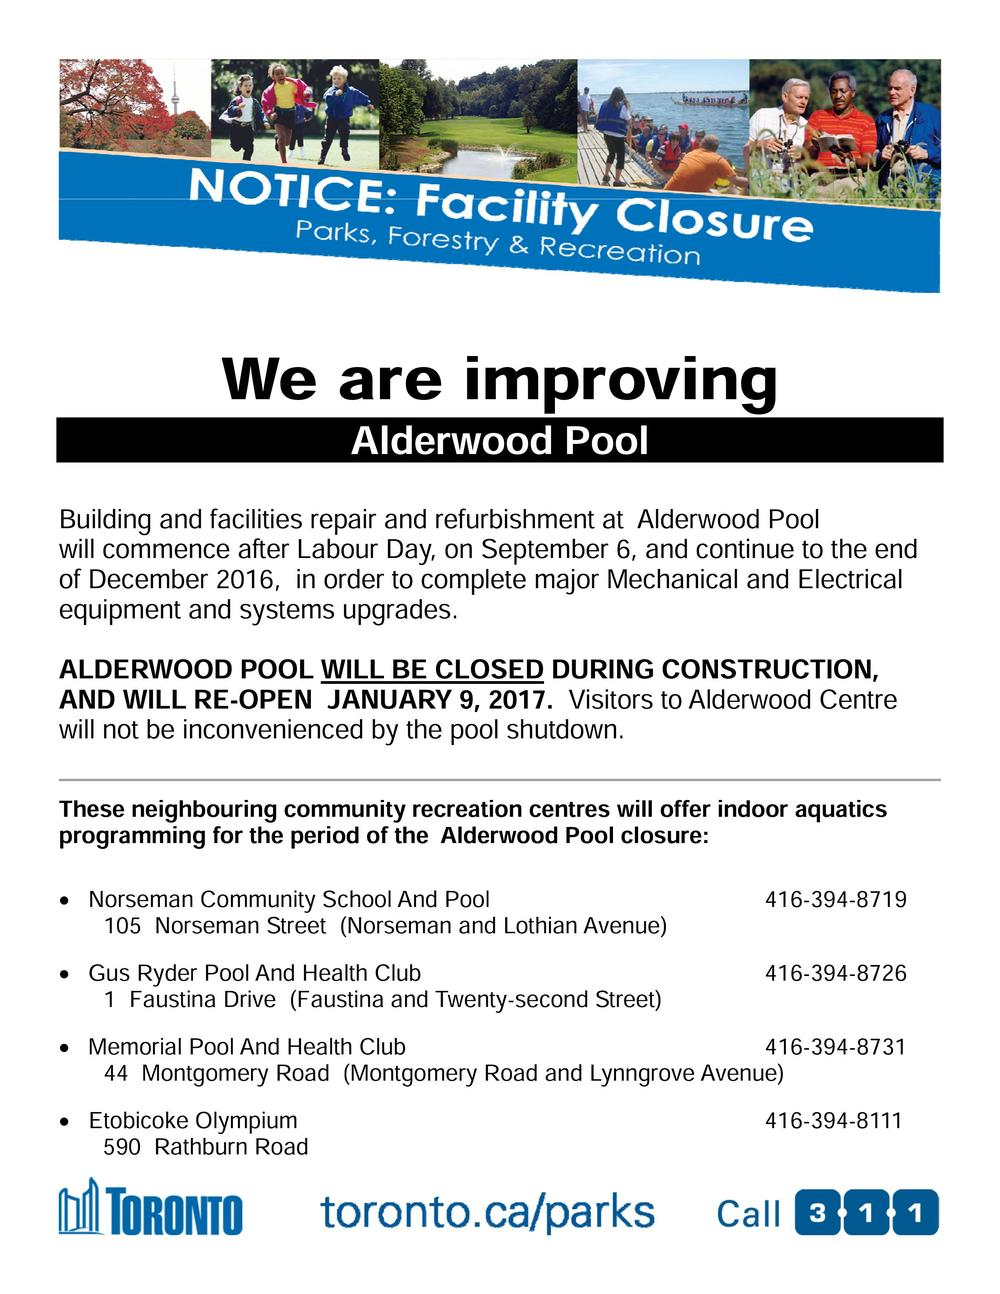 Alderwood Pool Notice.jpg